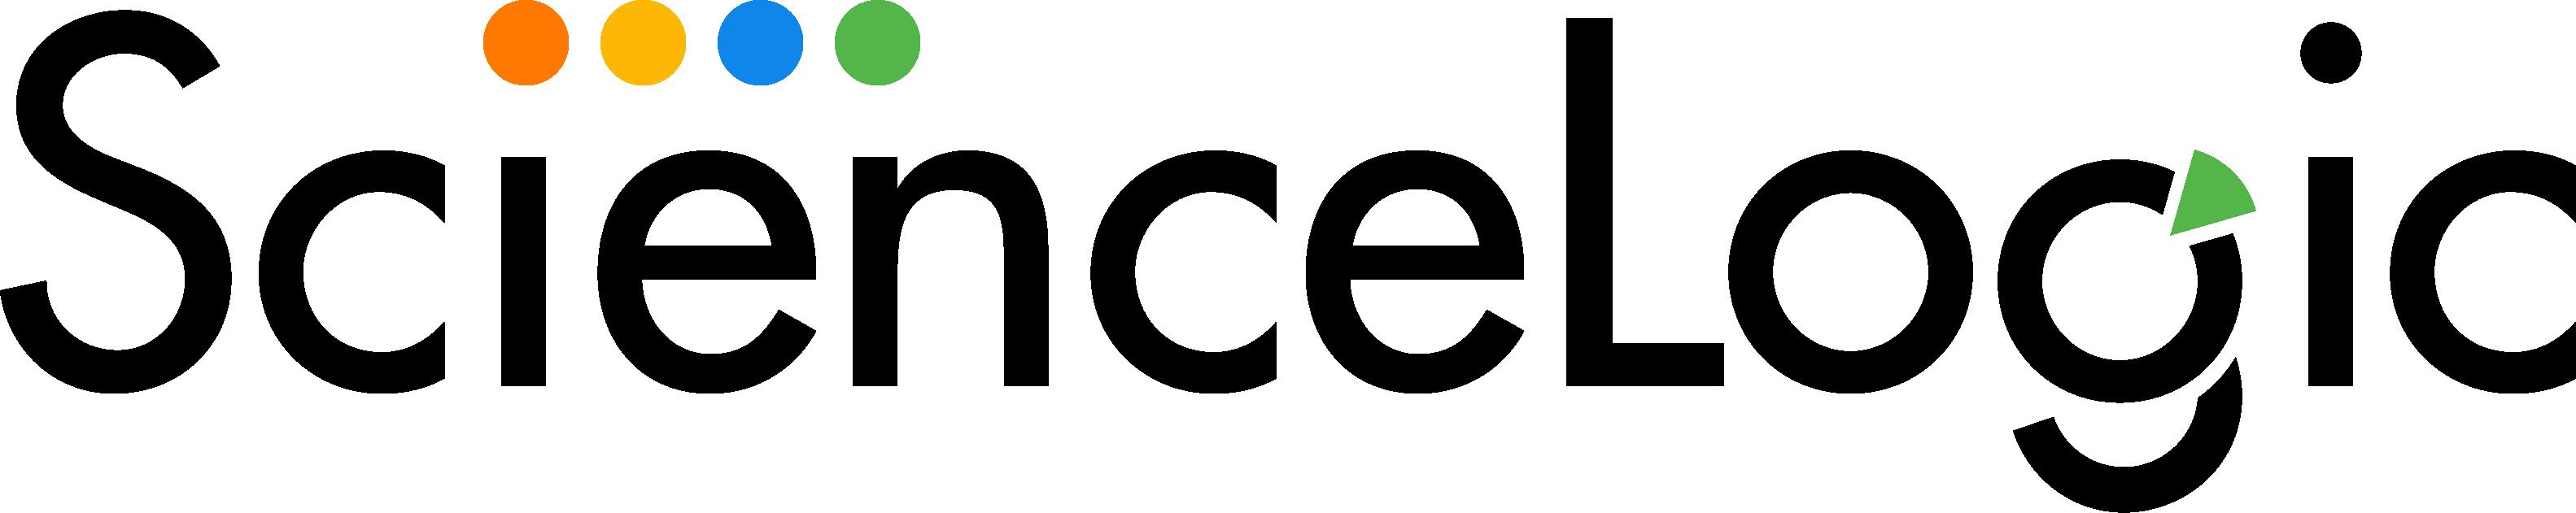 sciencelogic-logo